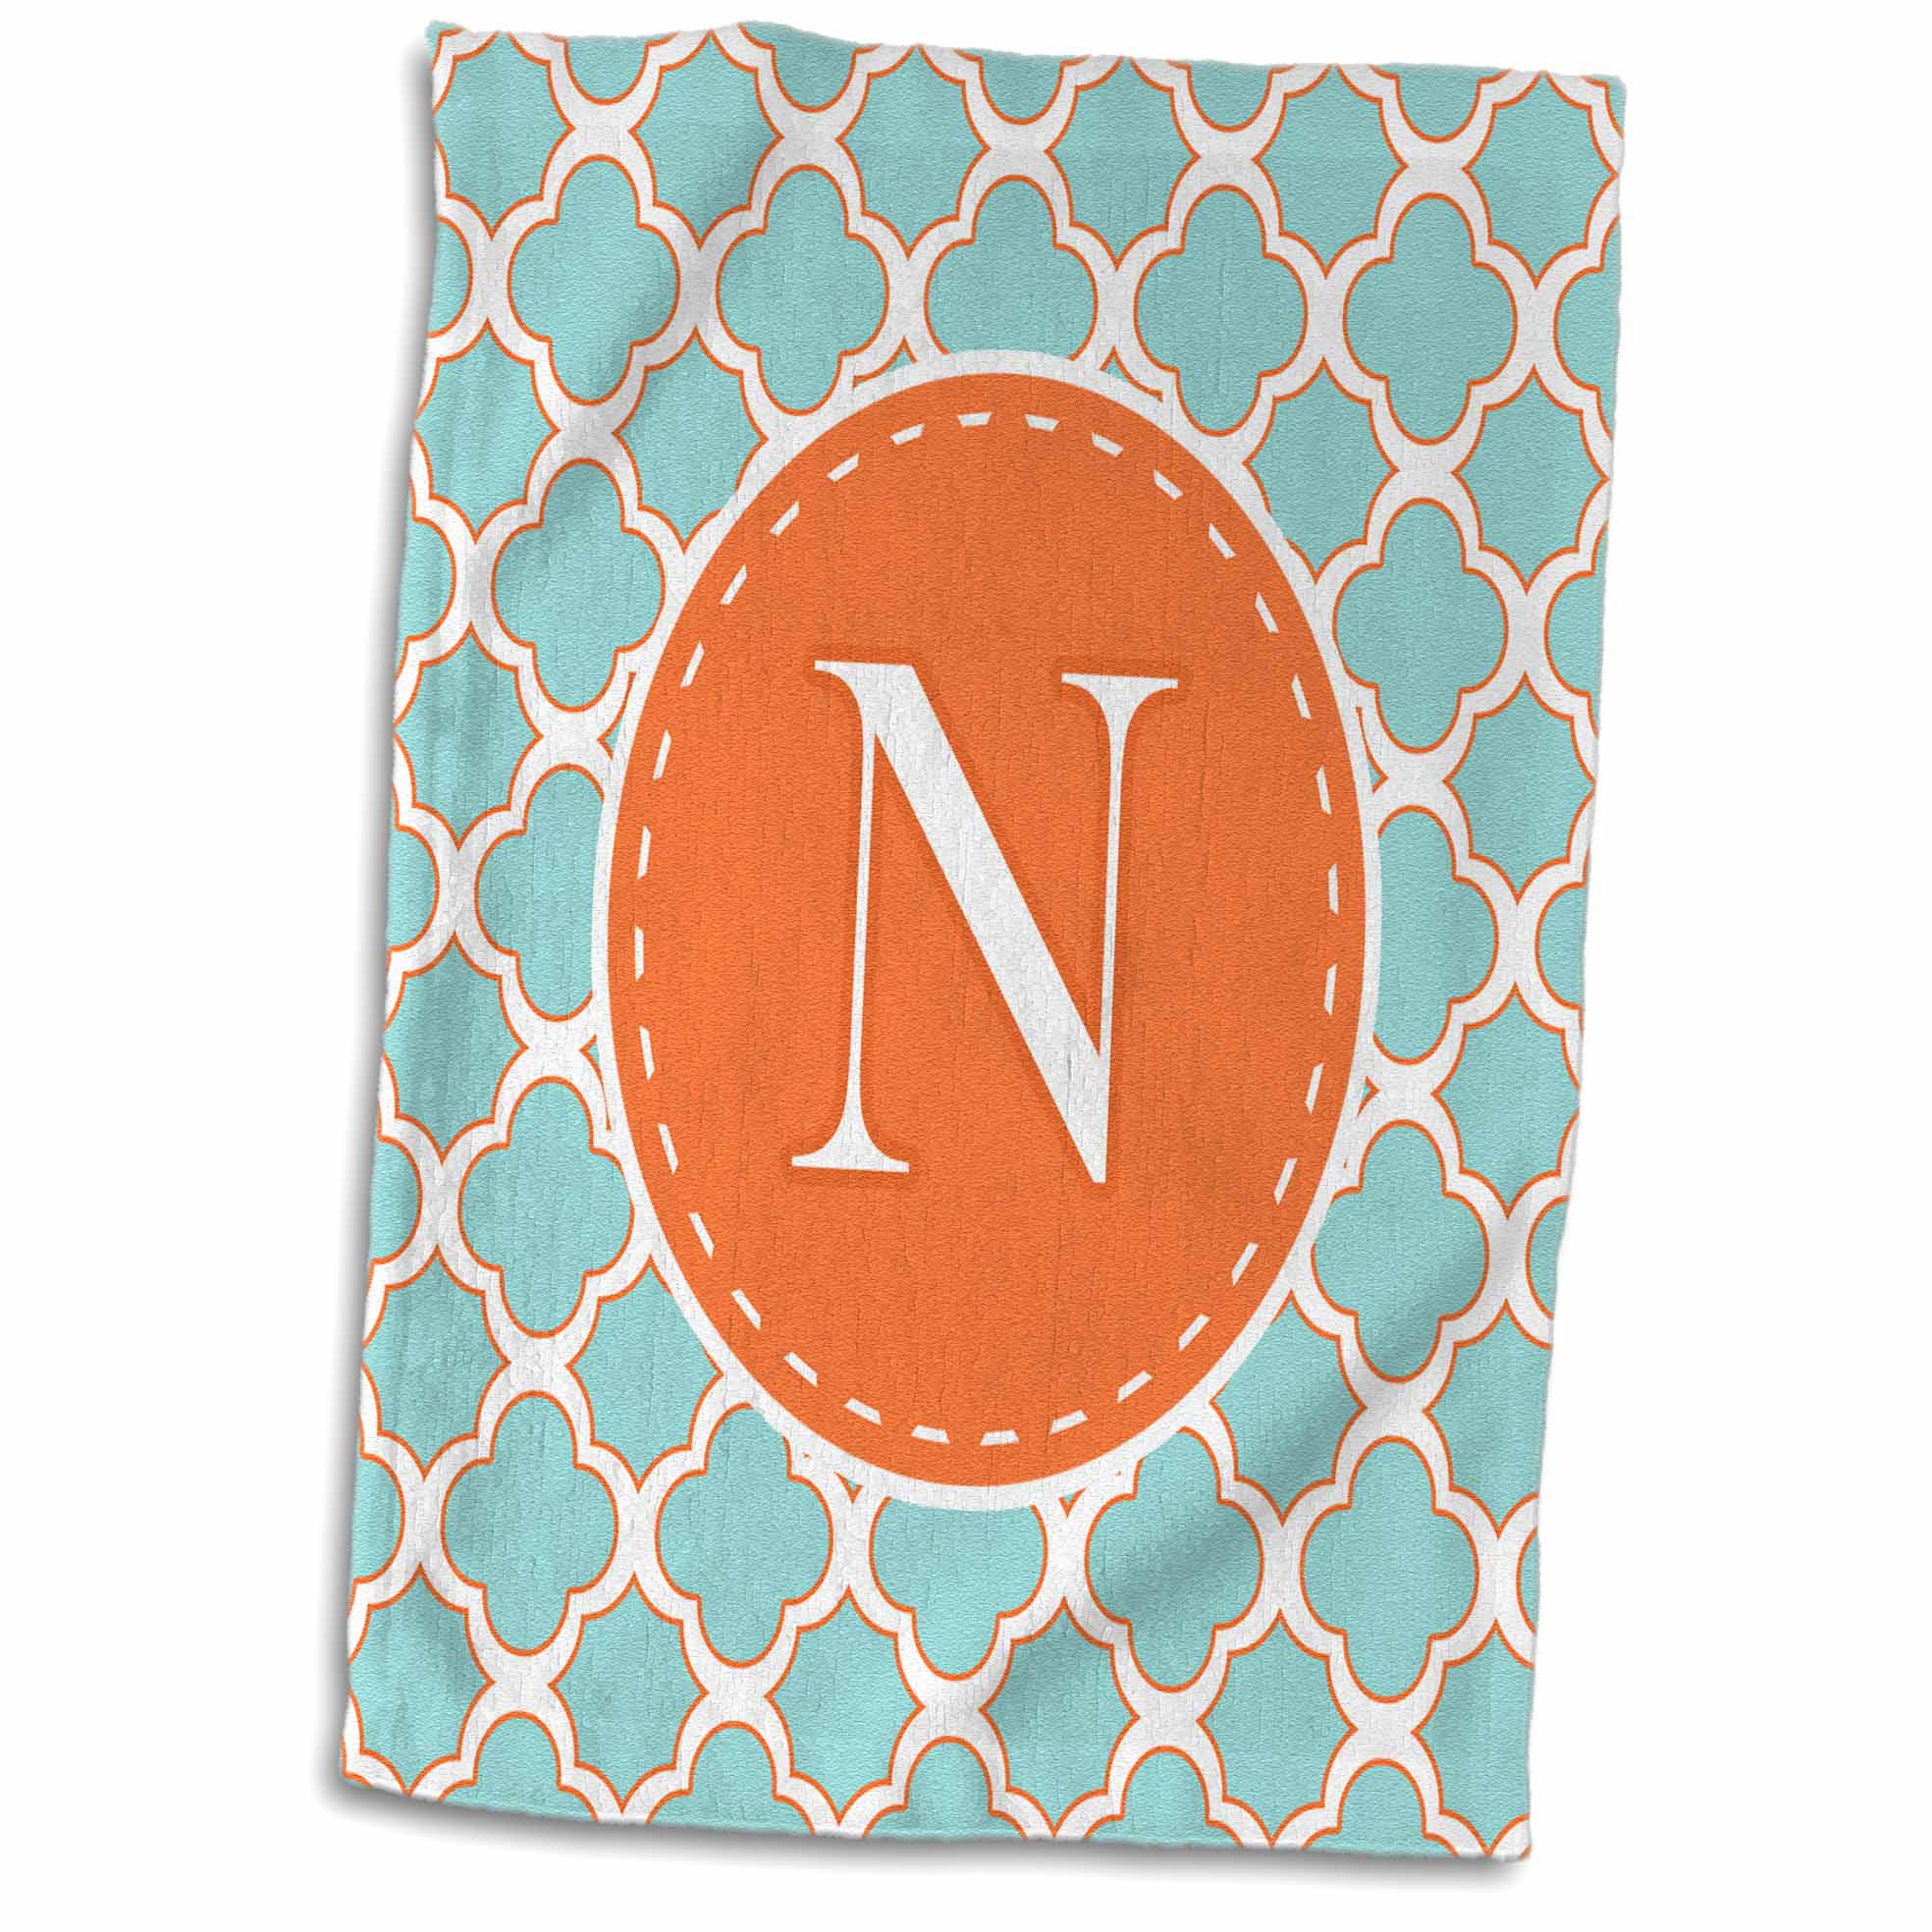 3dRose Letter N Monogram Orange and Blue Quatrefoil Pattern - Towel, 15 by 22-inch